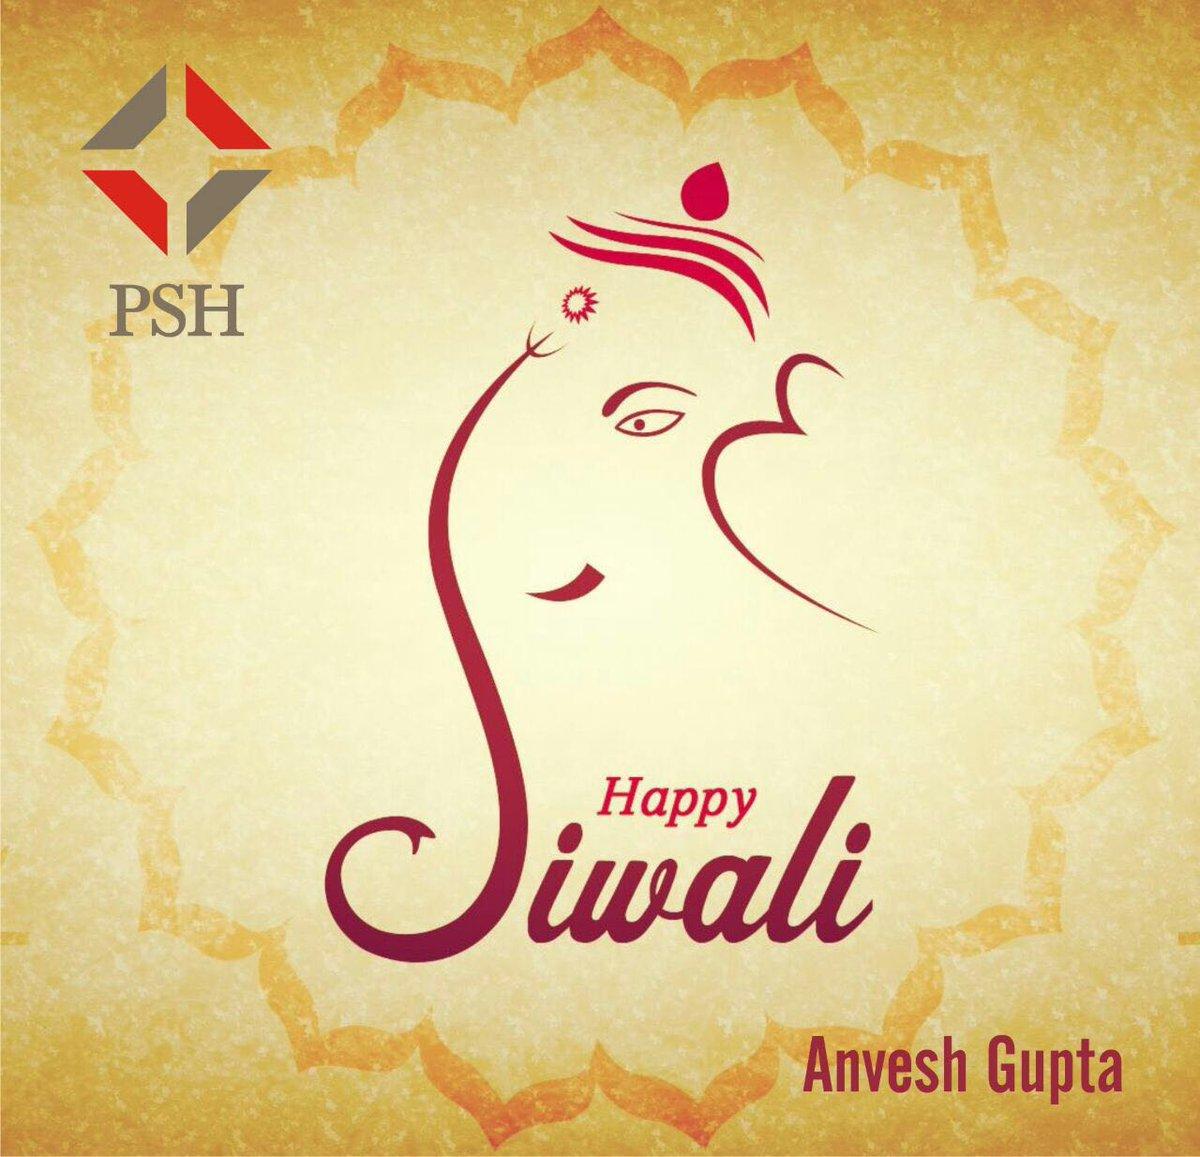 Ashok Tripathi On Twitter Happy Diwali